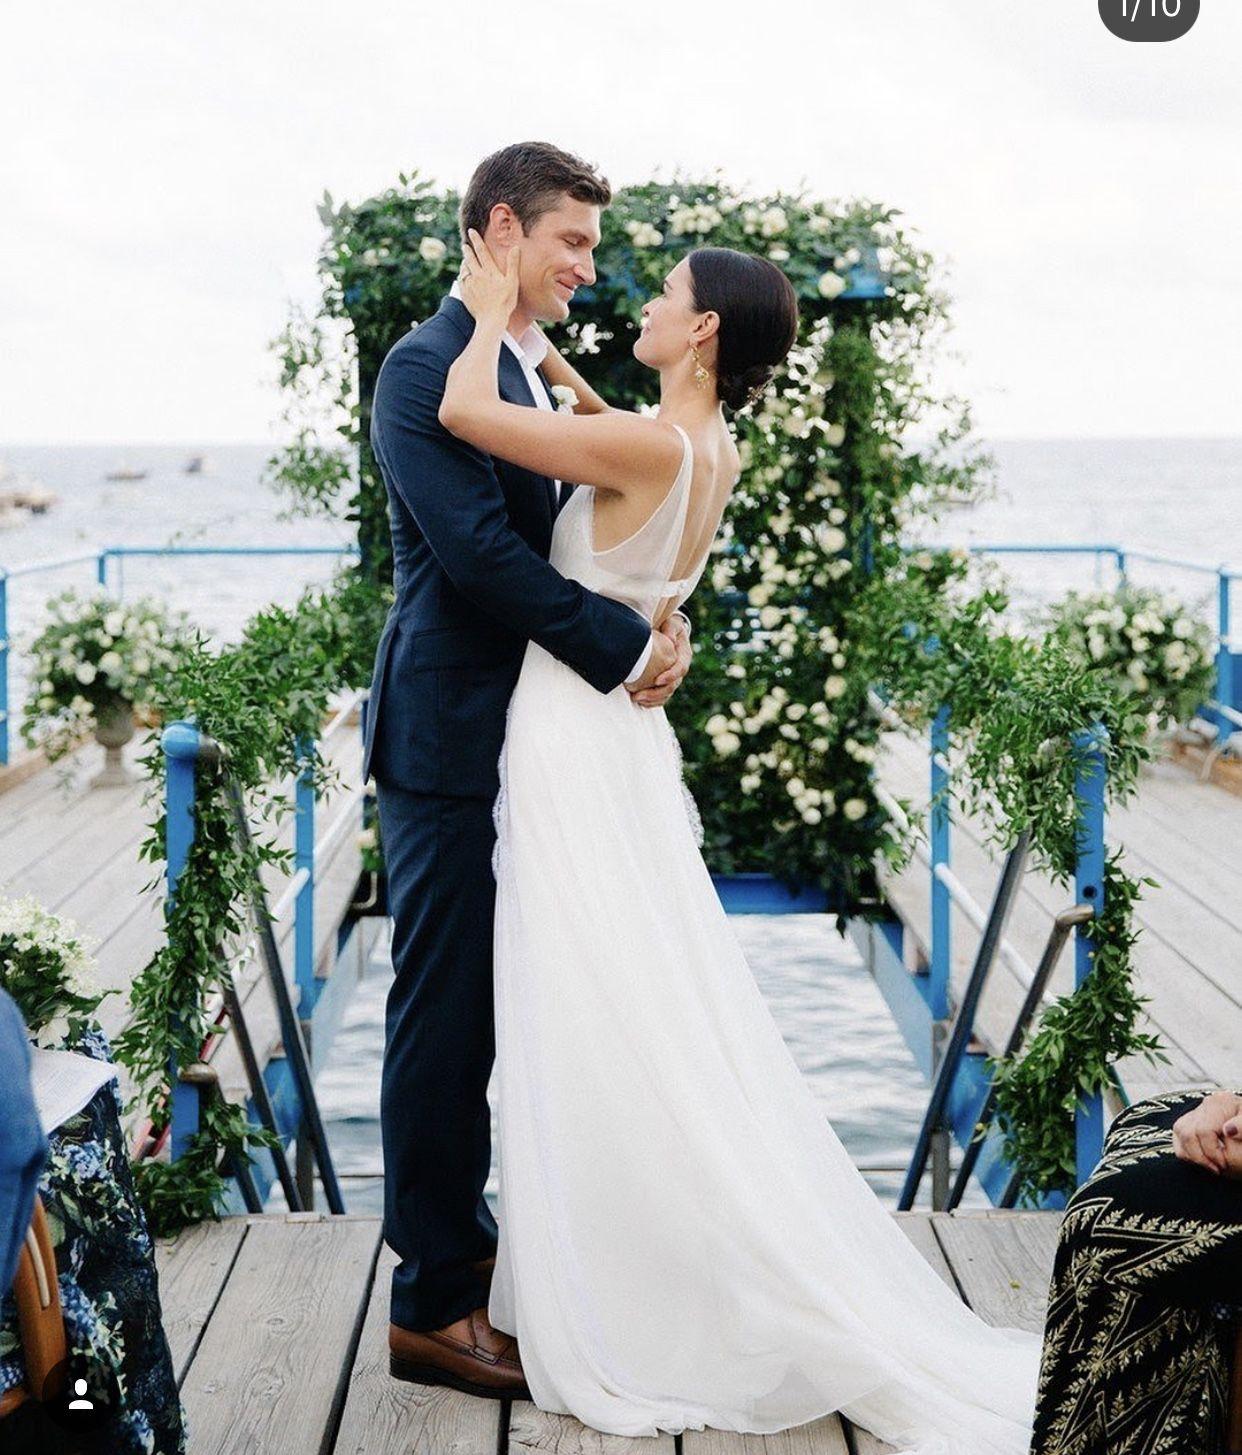 Wedding Image By Alex Clinger